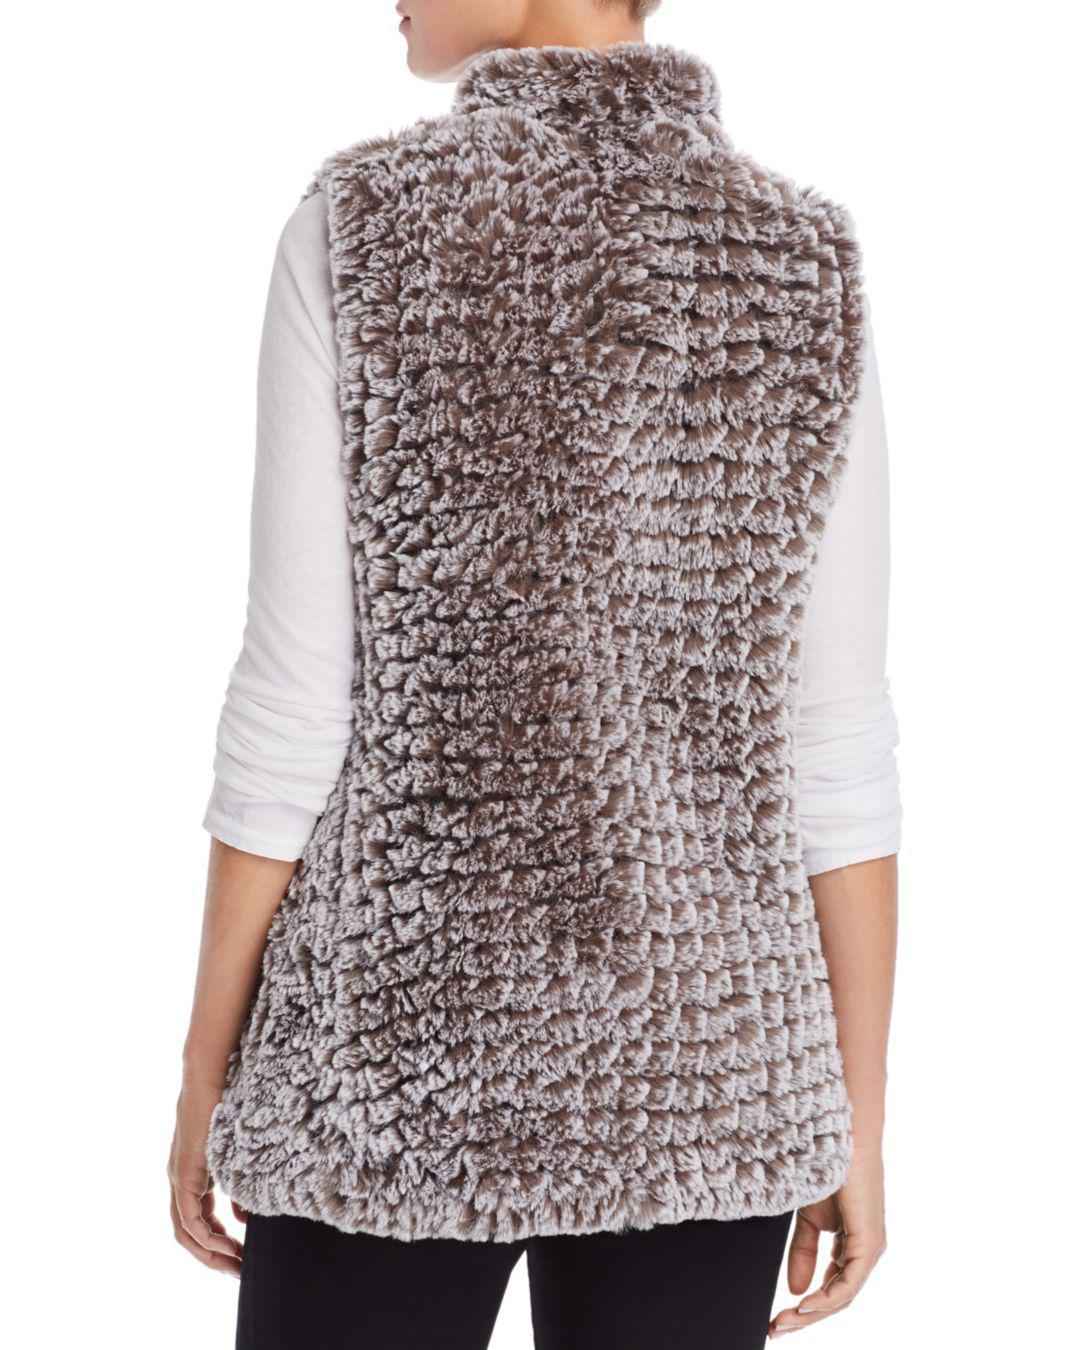 c821cb5cca895 Lyst - Aqua Faux Fur Vest in Gray - Save 41%